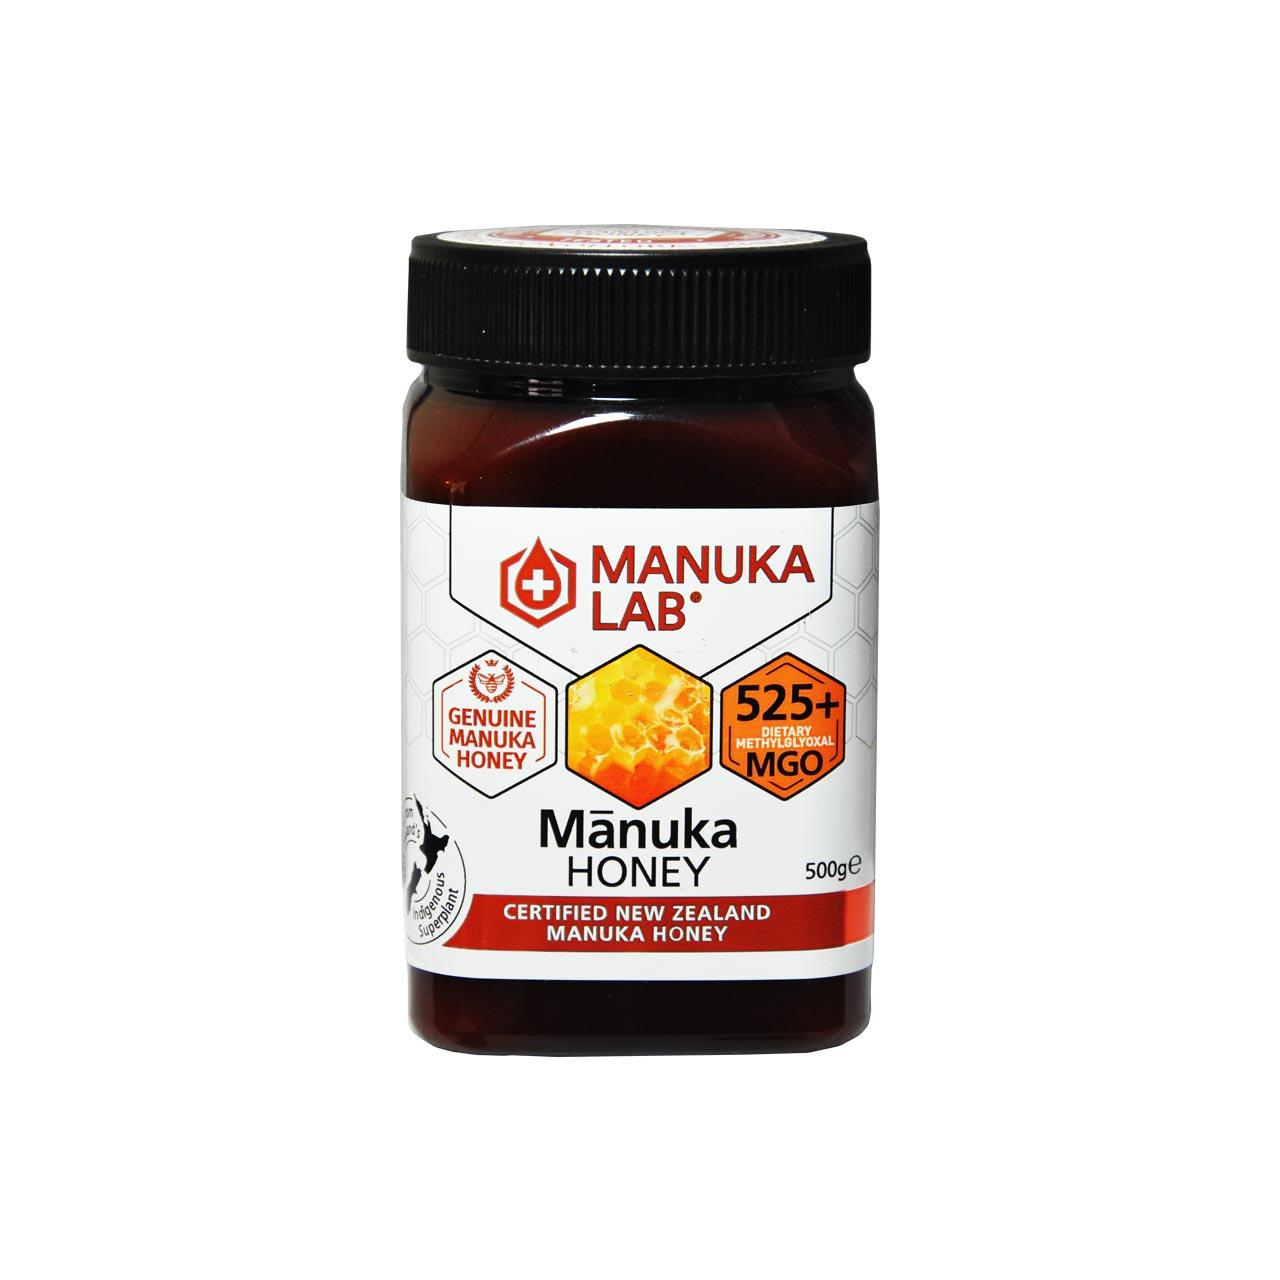 عسل مانوکا +۵۲۵ MGO